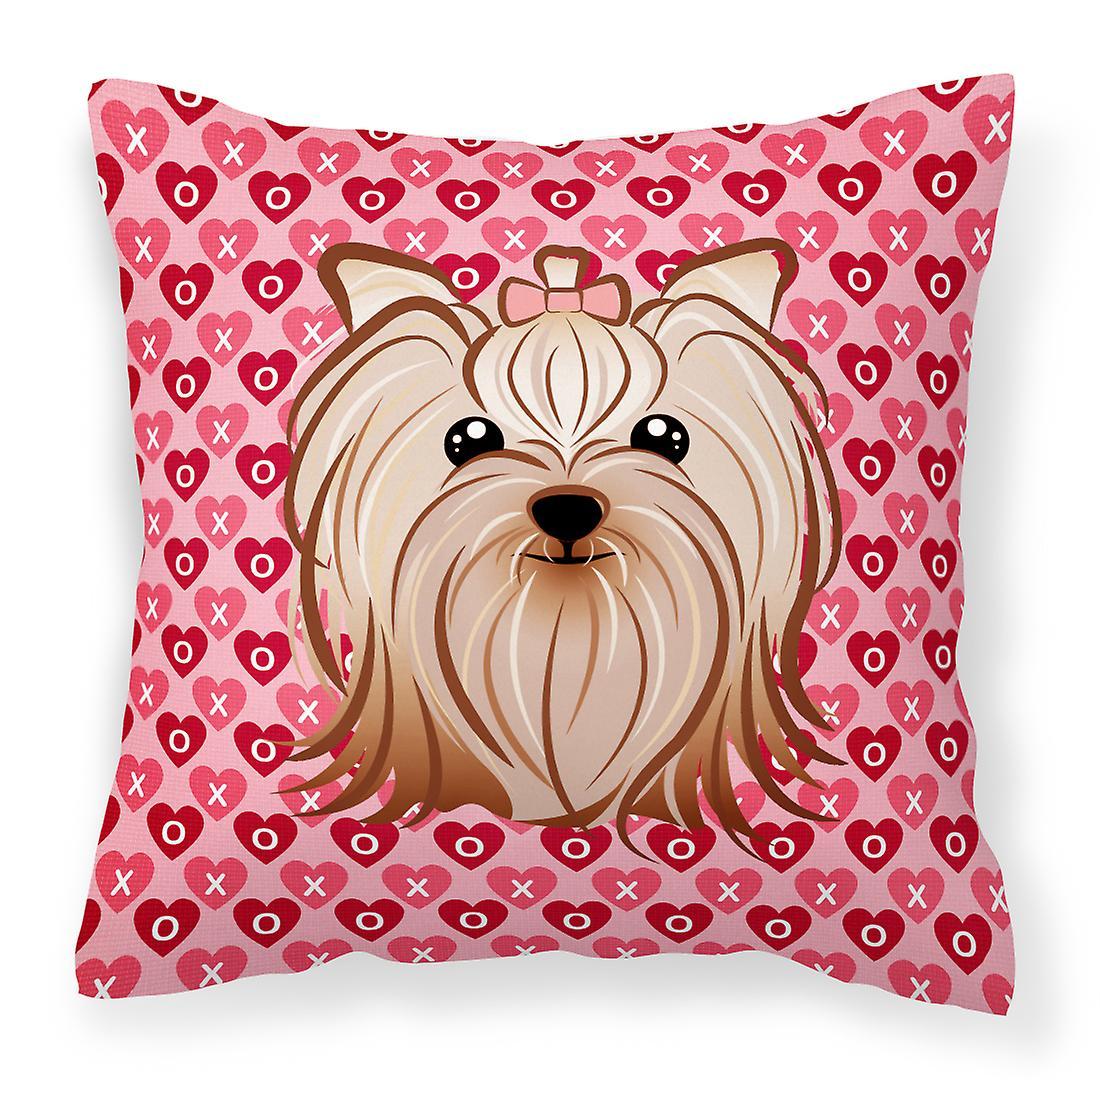 Yorkshire Tissu Yorkishire Coeurs Décoratif Oreiller Terrier yY6gb7fv